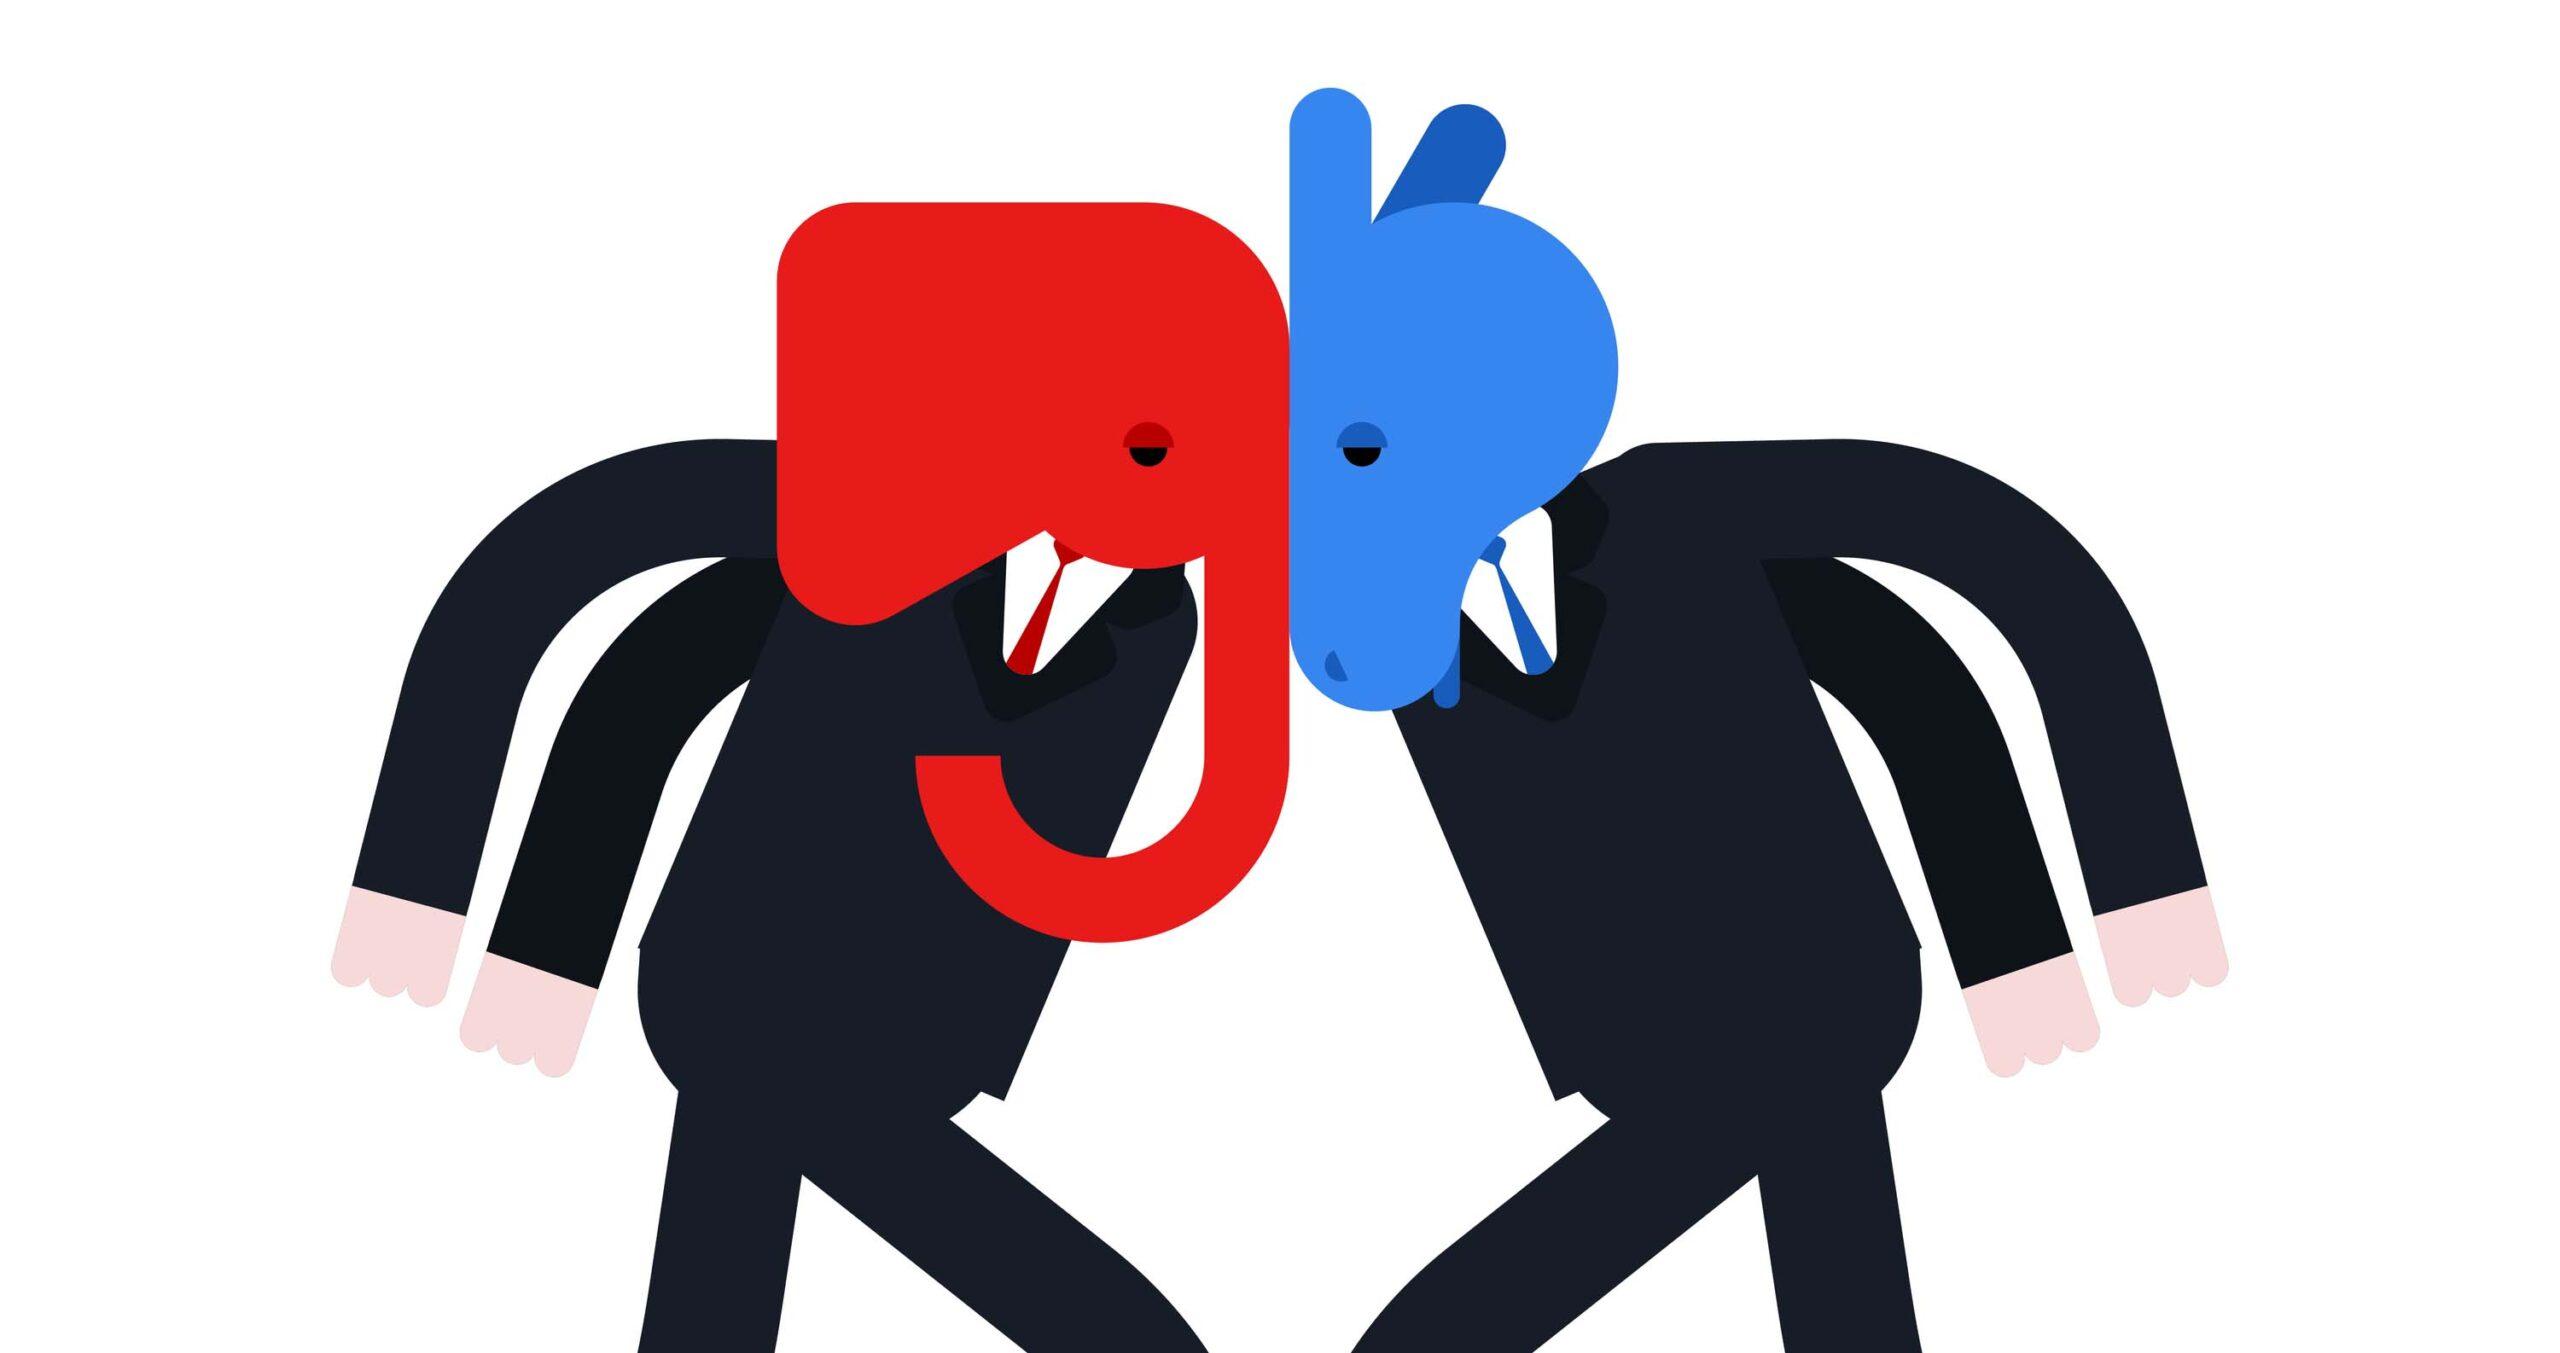 Election Democrat vs. Republican